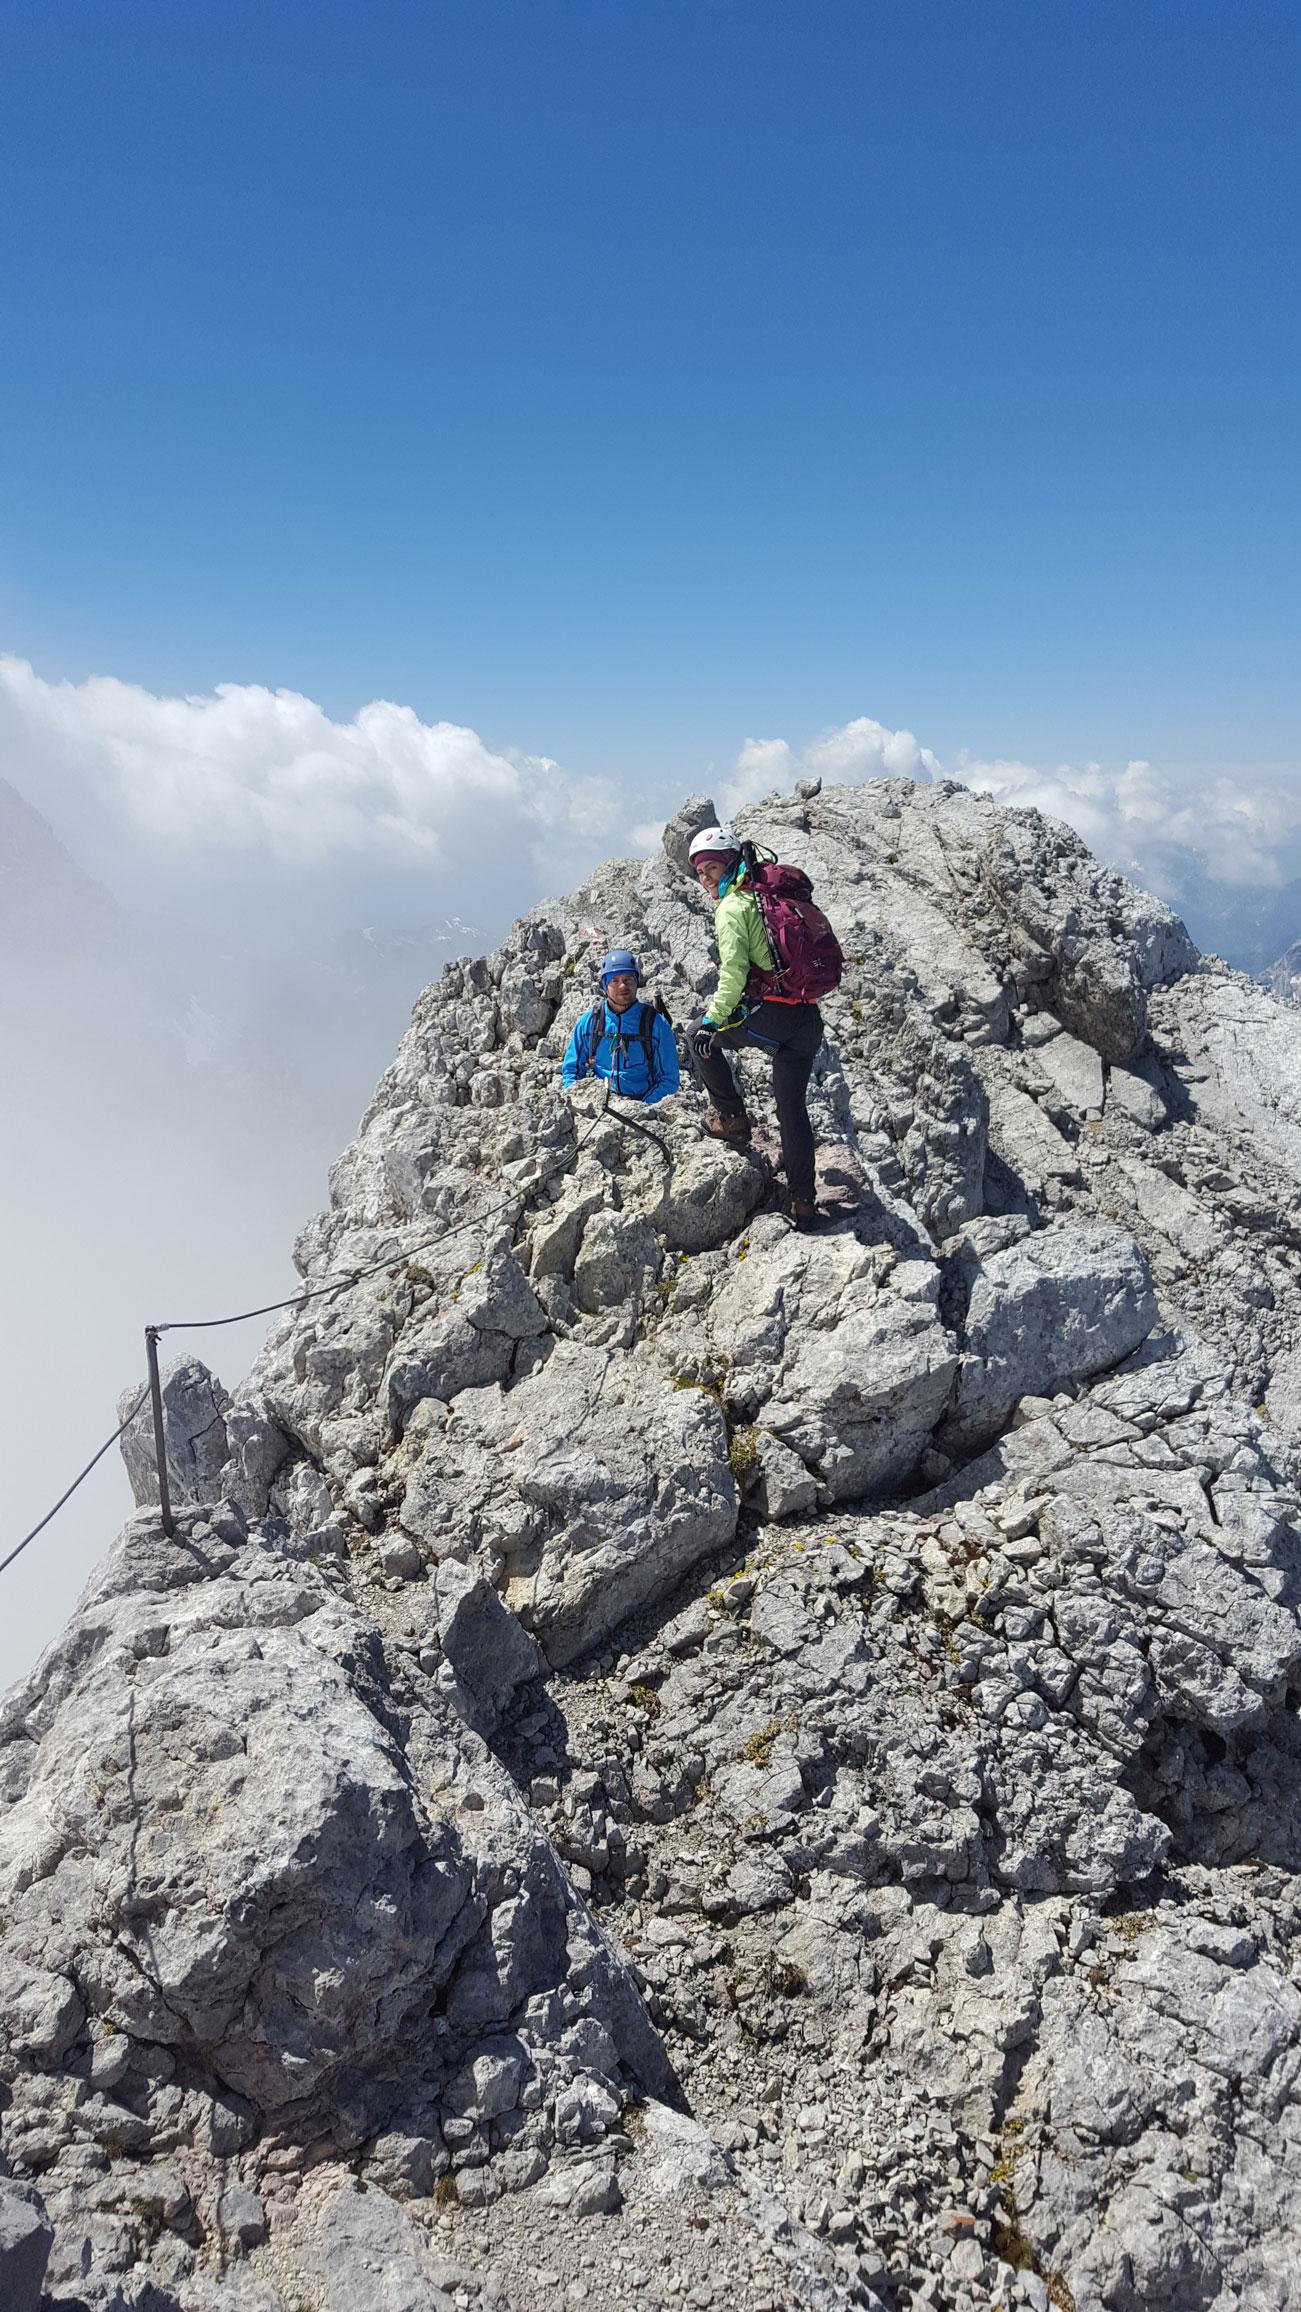 Tourenbericht Watzmann Überschreitung - Munich Mountain Girls